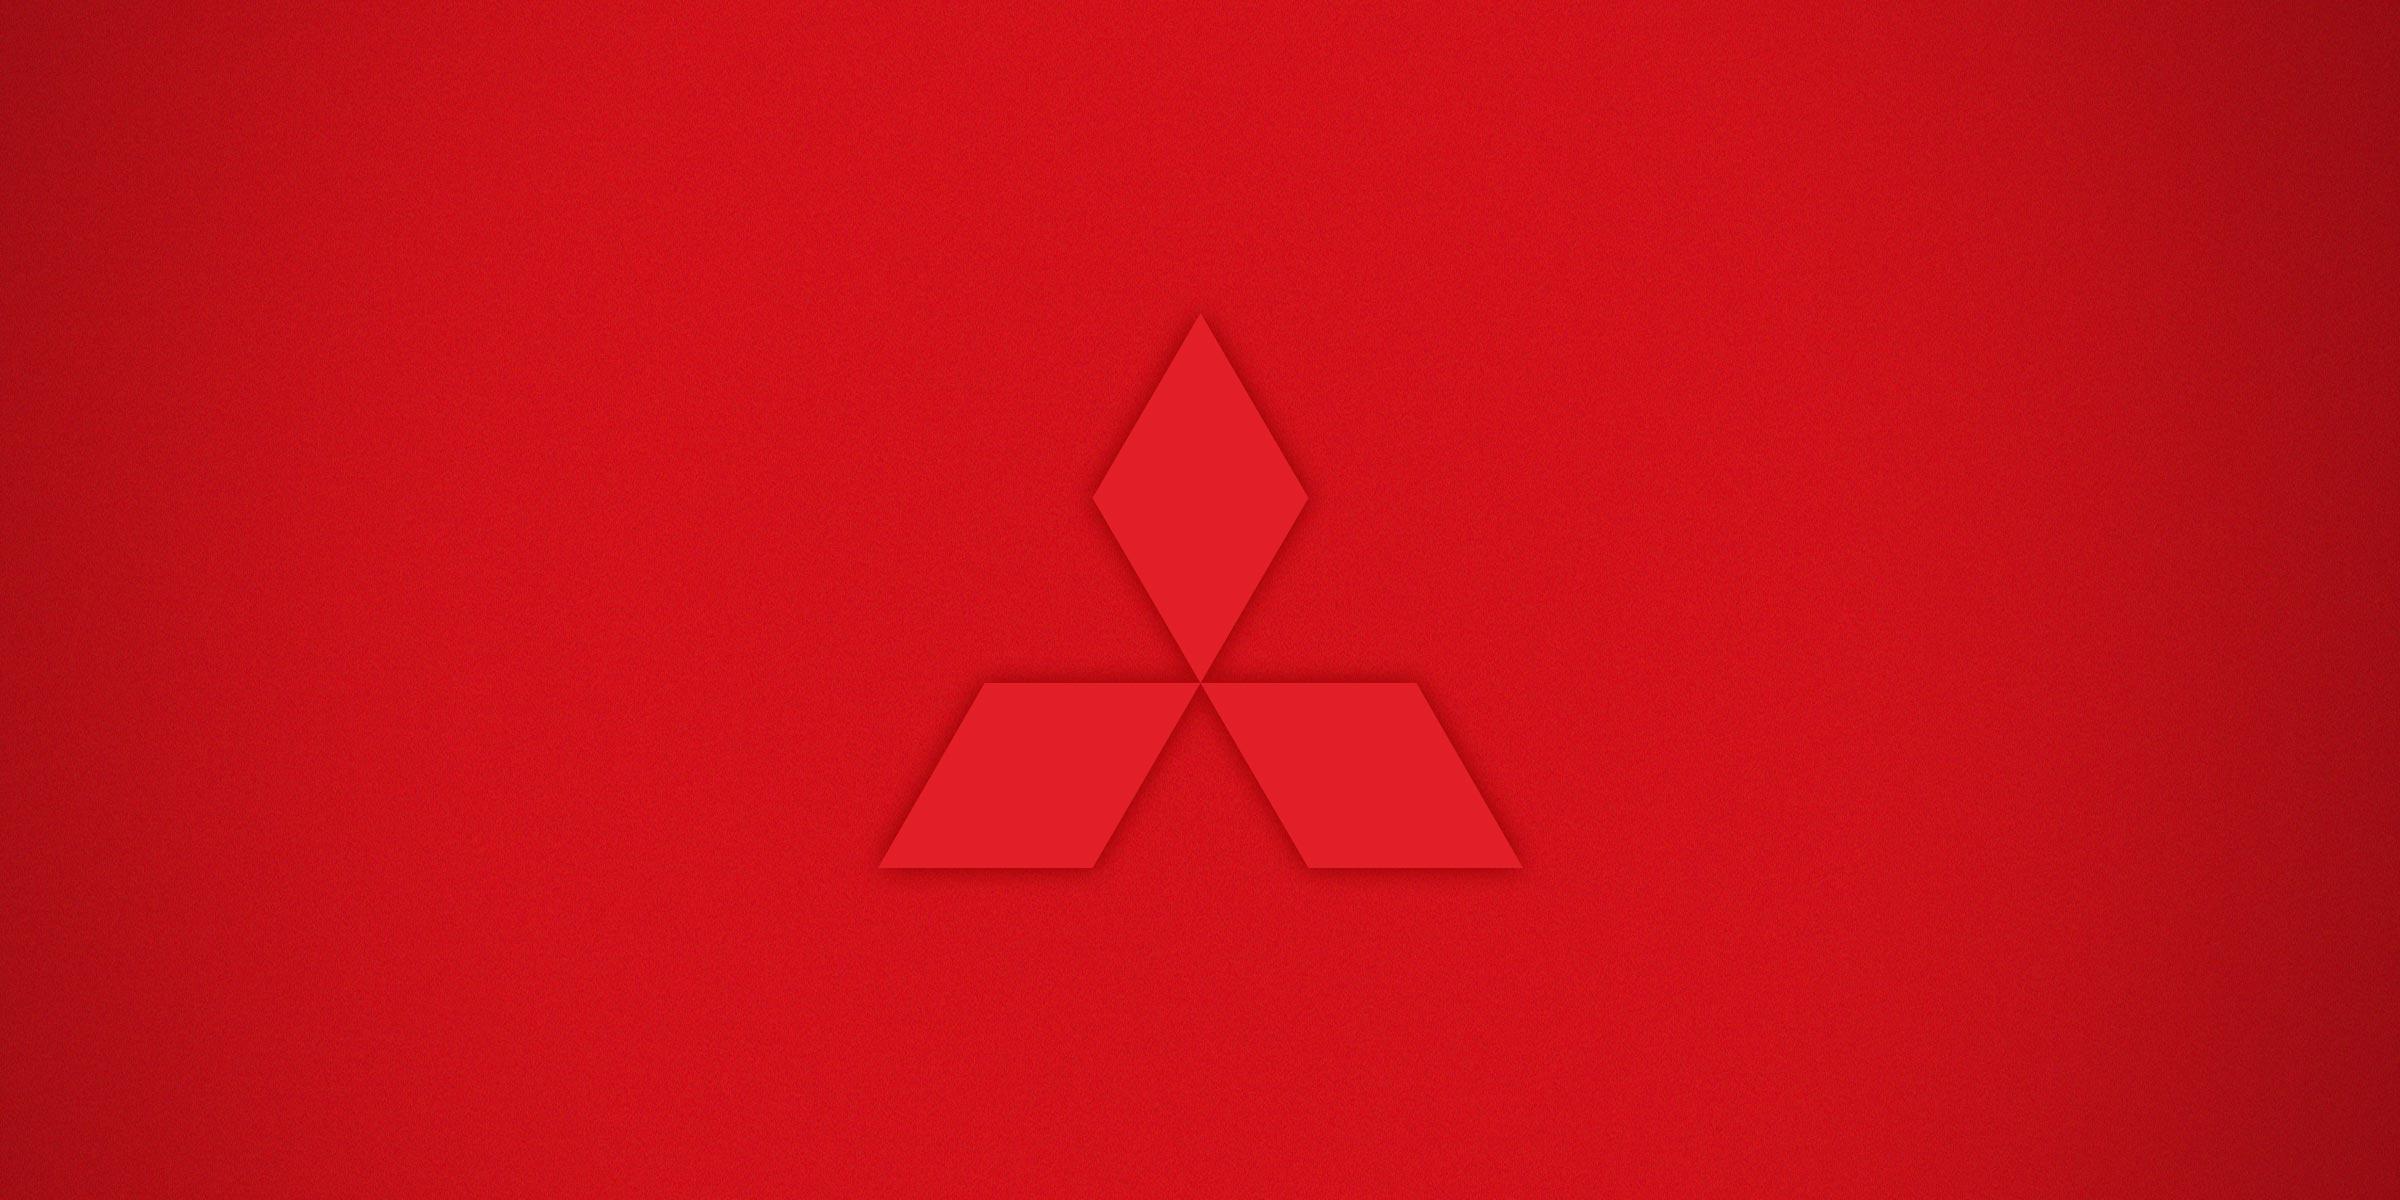 Mitsubishi symbol on red background